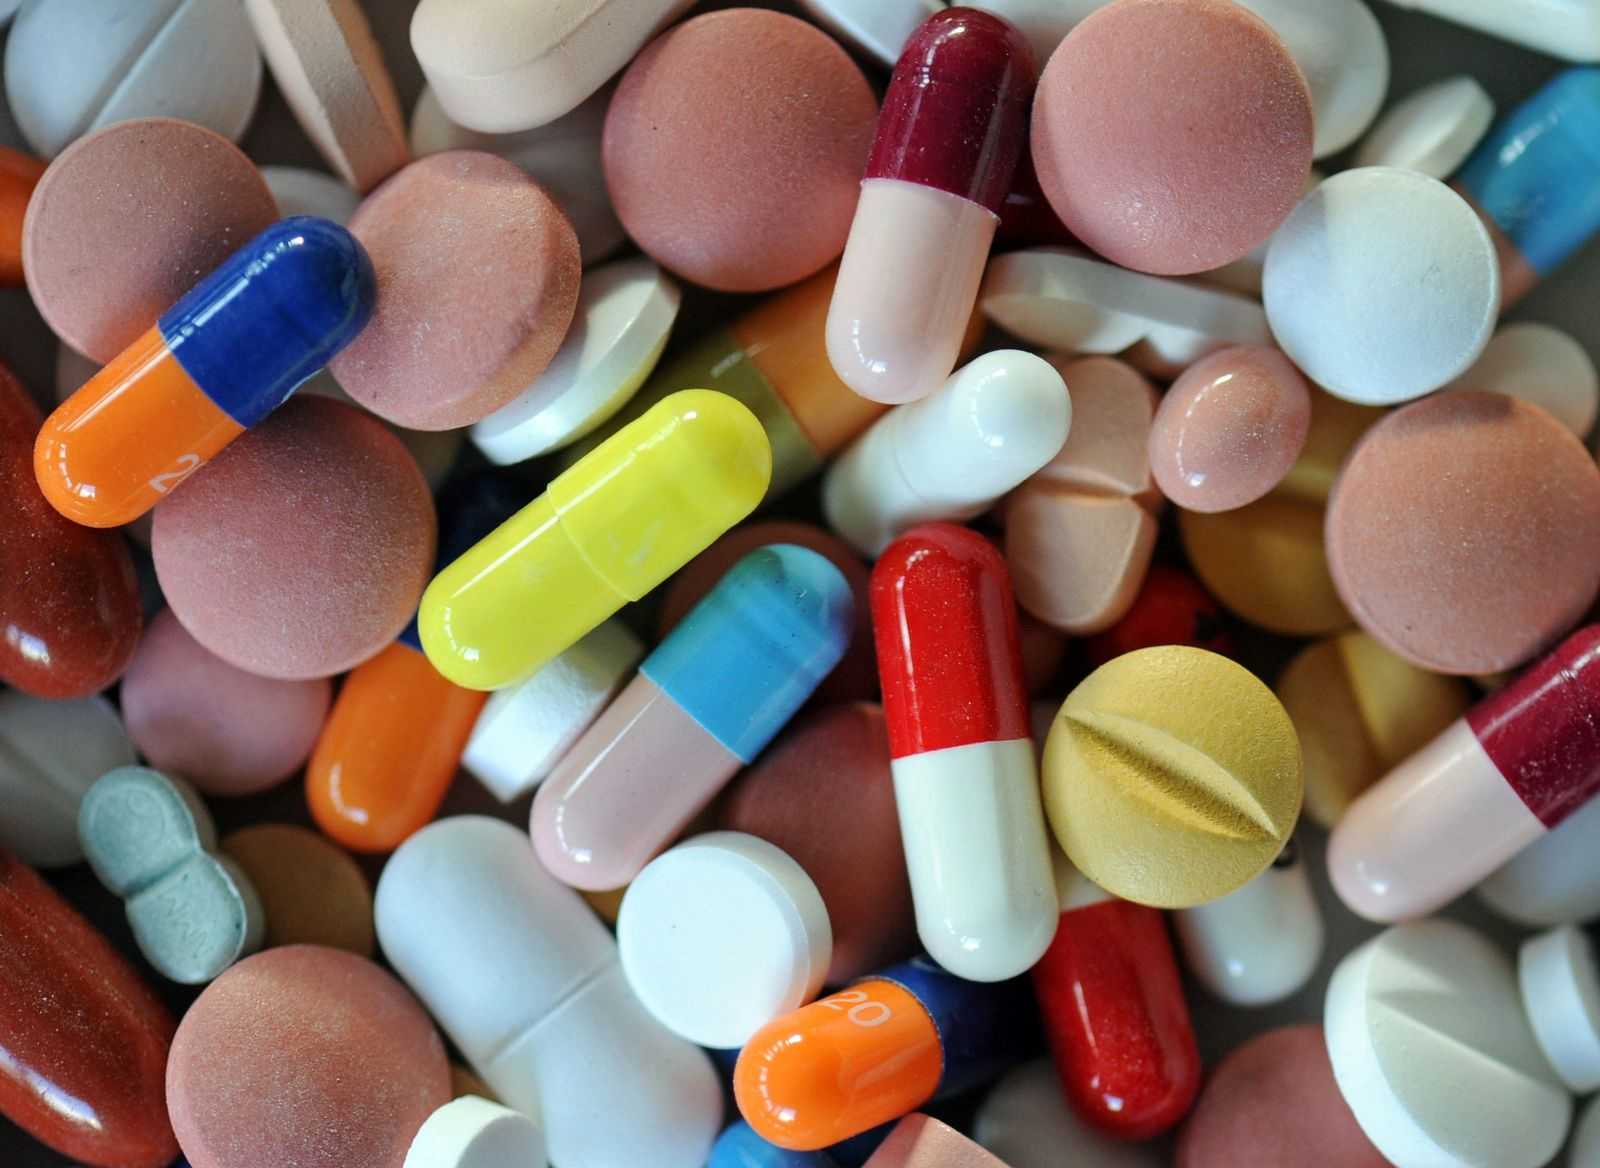 Russland/ Verrückte Gesetzesinitiativen/ Medikamente